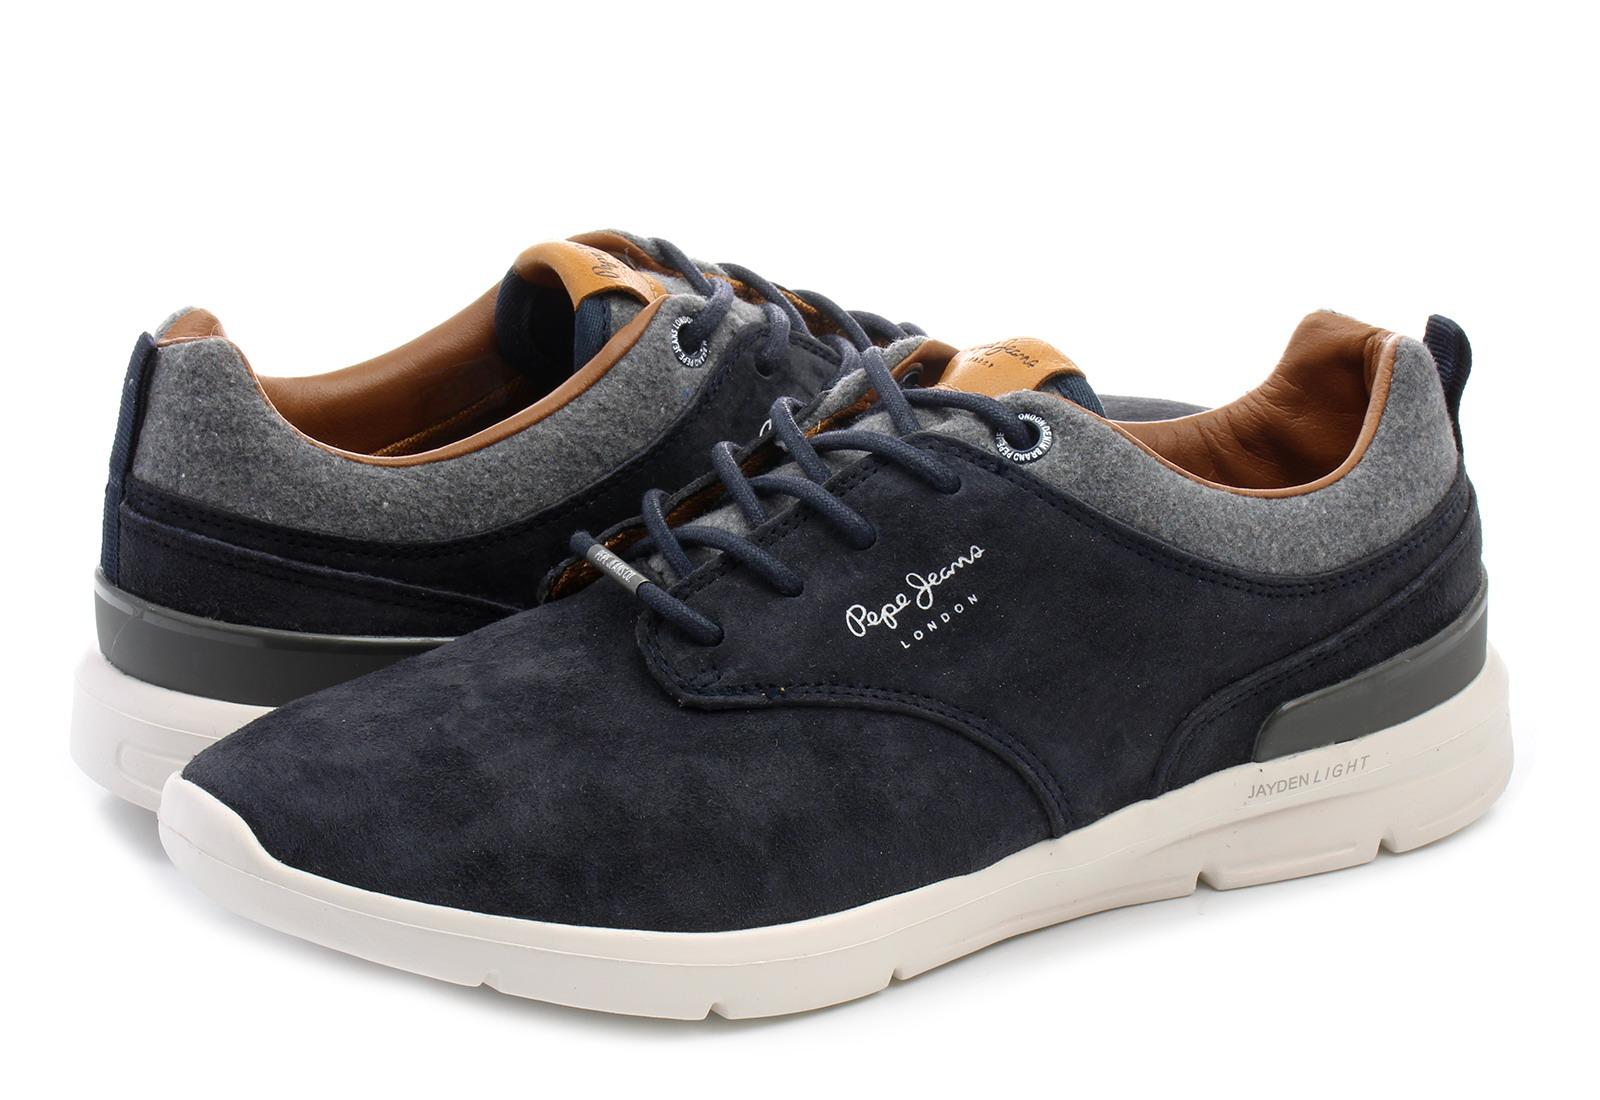 Pepe Jeans Shoes - Jayden - PMS30389585 - Online shop for ... 934a577686